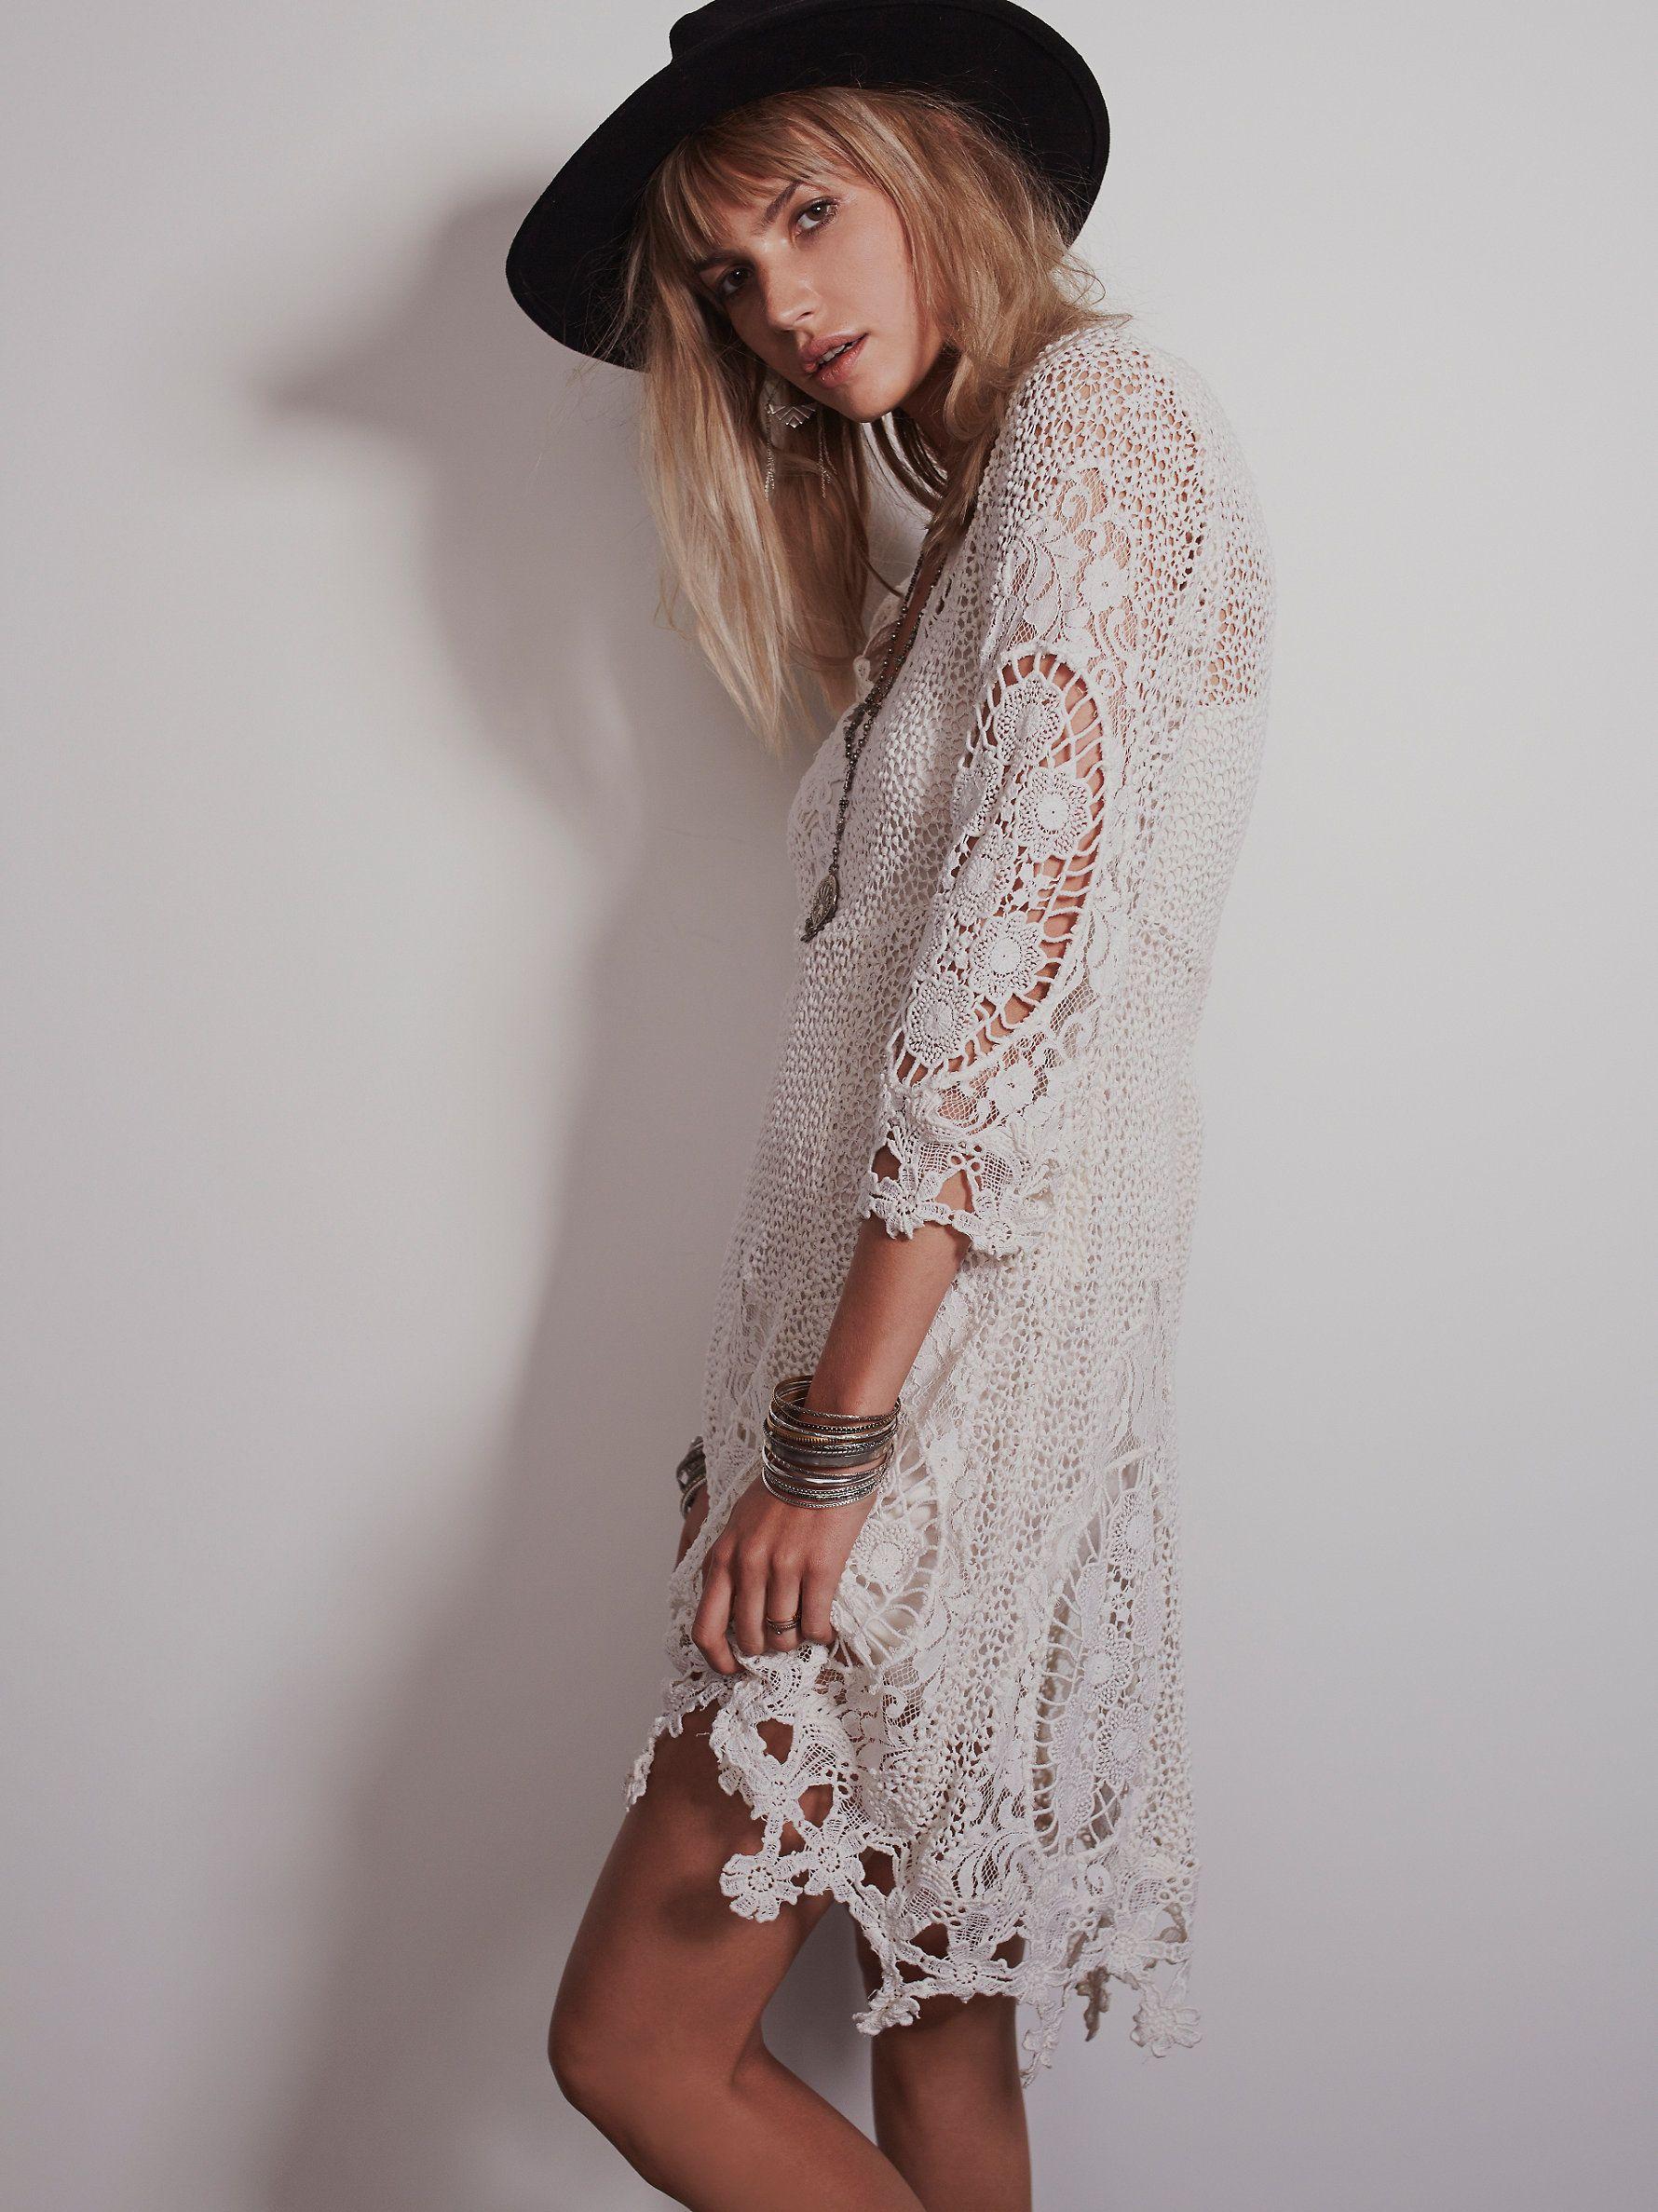 Free people white lace slip dress